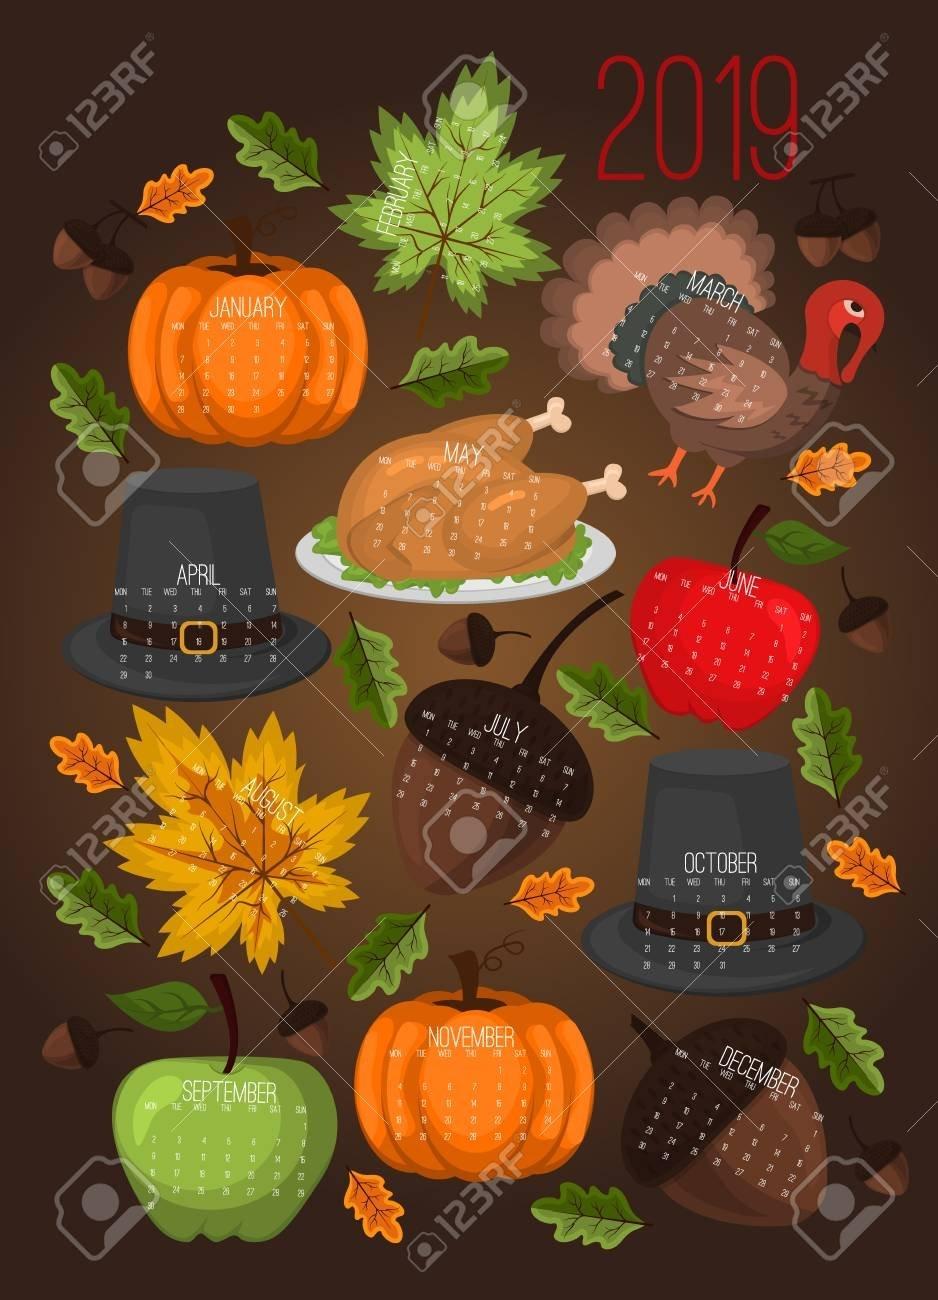 Calendar 2019 Thanksgiving Day Poster Autumn Harvest Food Festival Calendar 2019 Thanksgiving